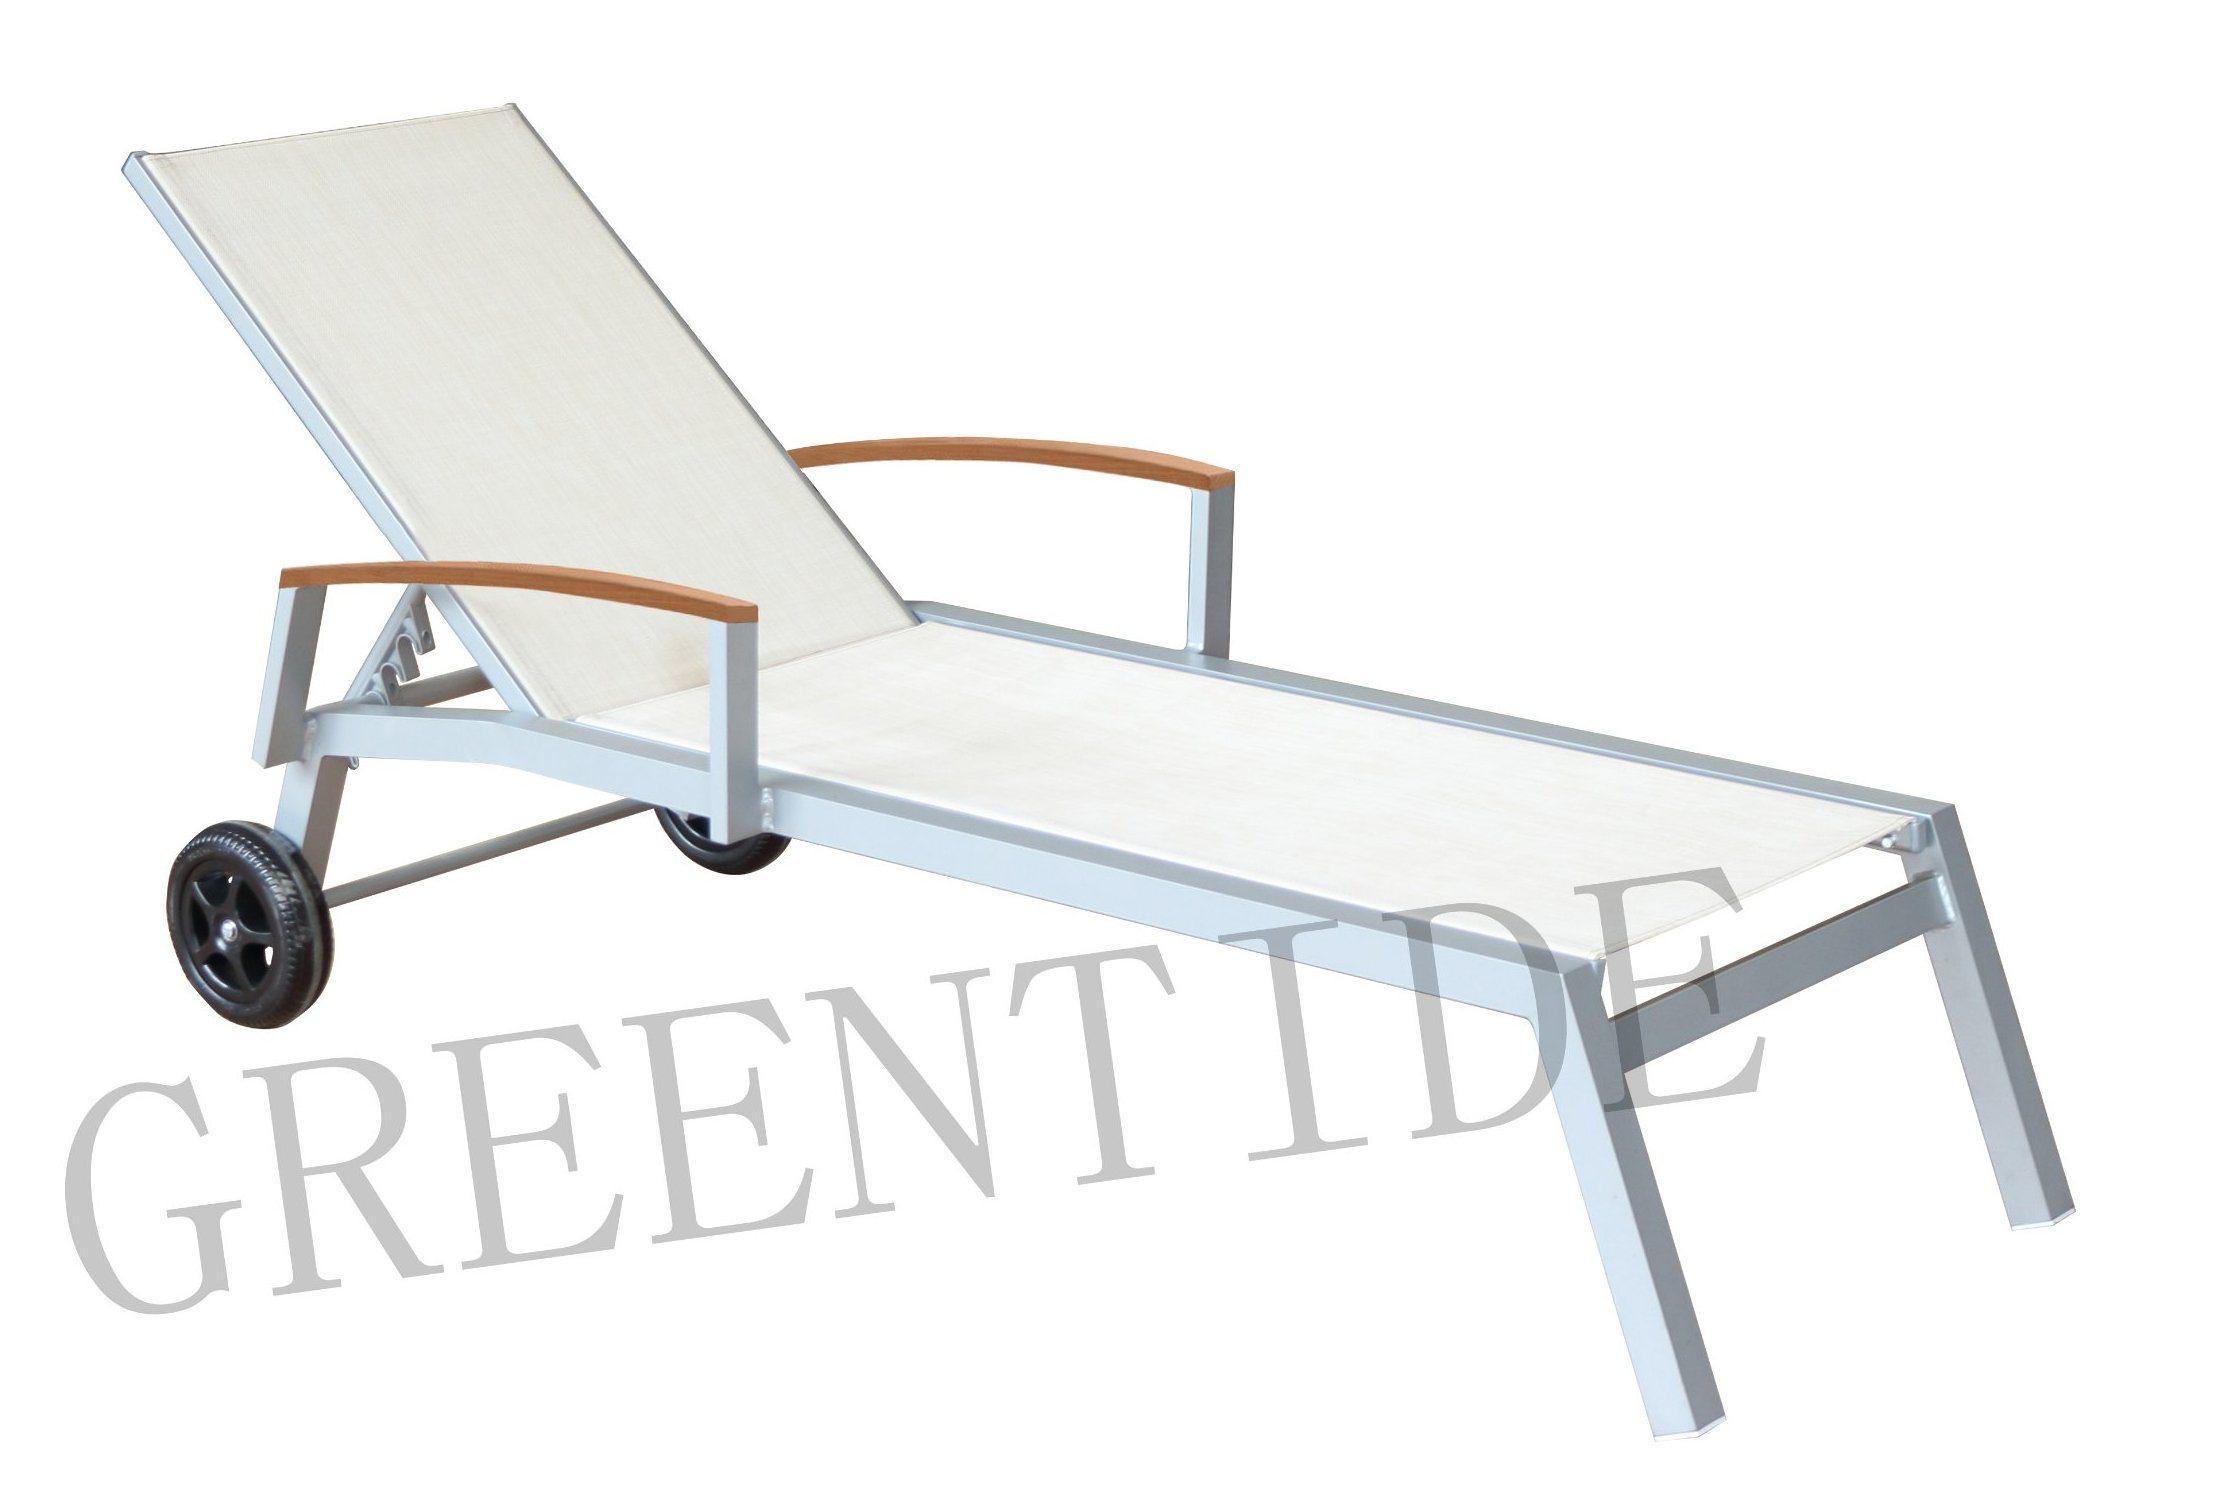 Aluminum Outdoor Patio Furniture Textilene Pool Chair Beach Sun Lounger with Wheels